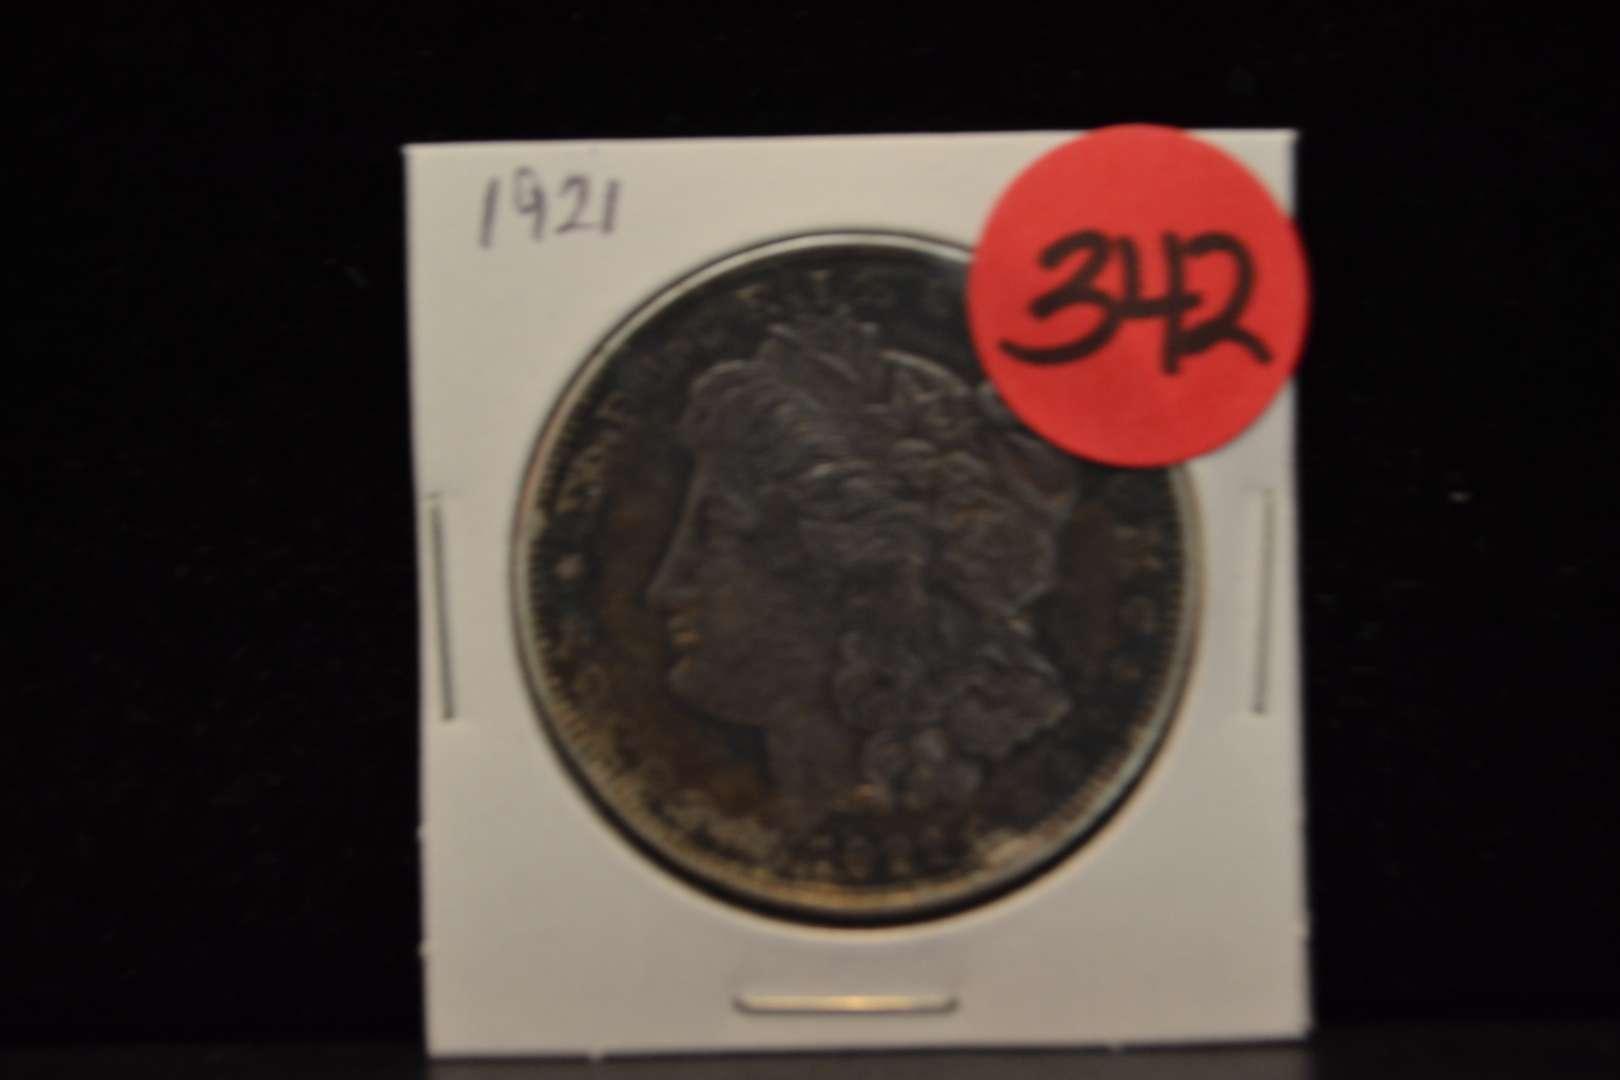 Lot # 342 1921 MORGAN SILVER DOLLAR